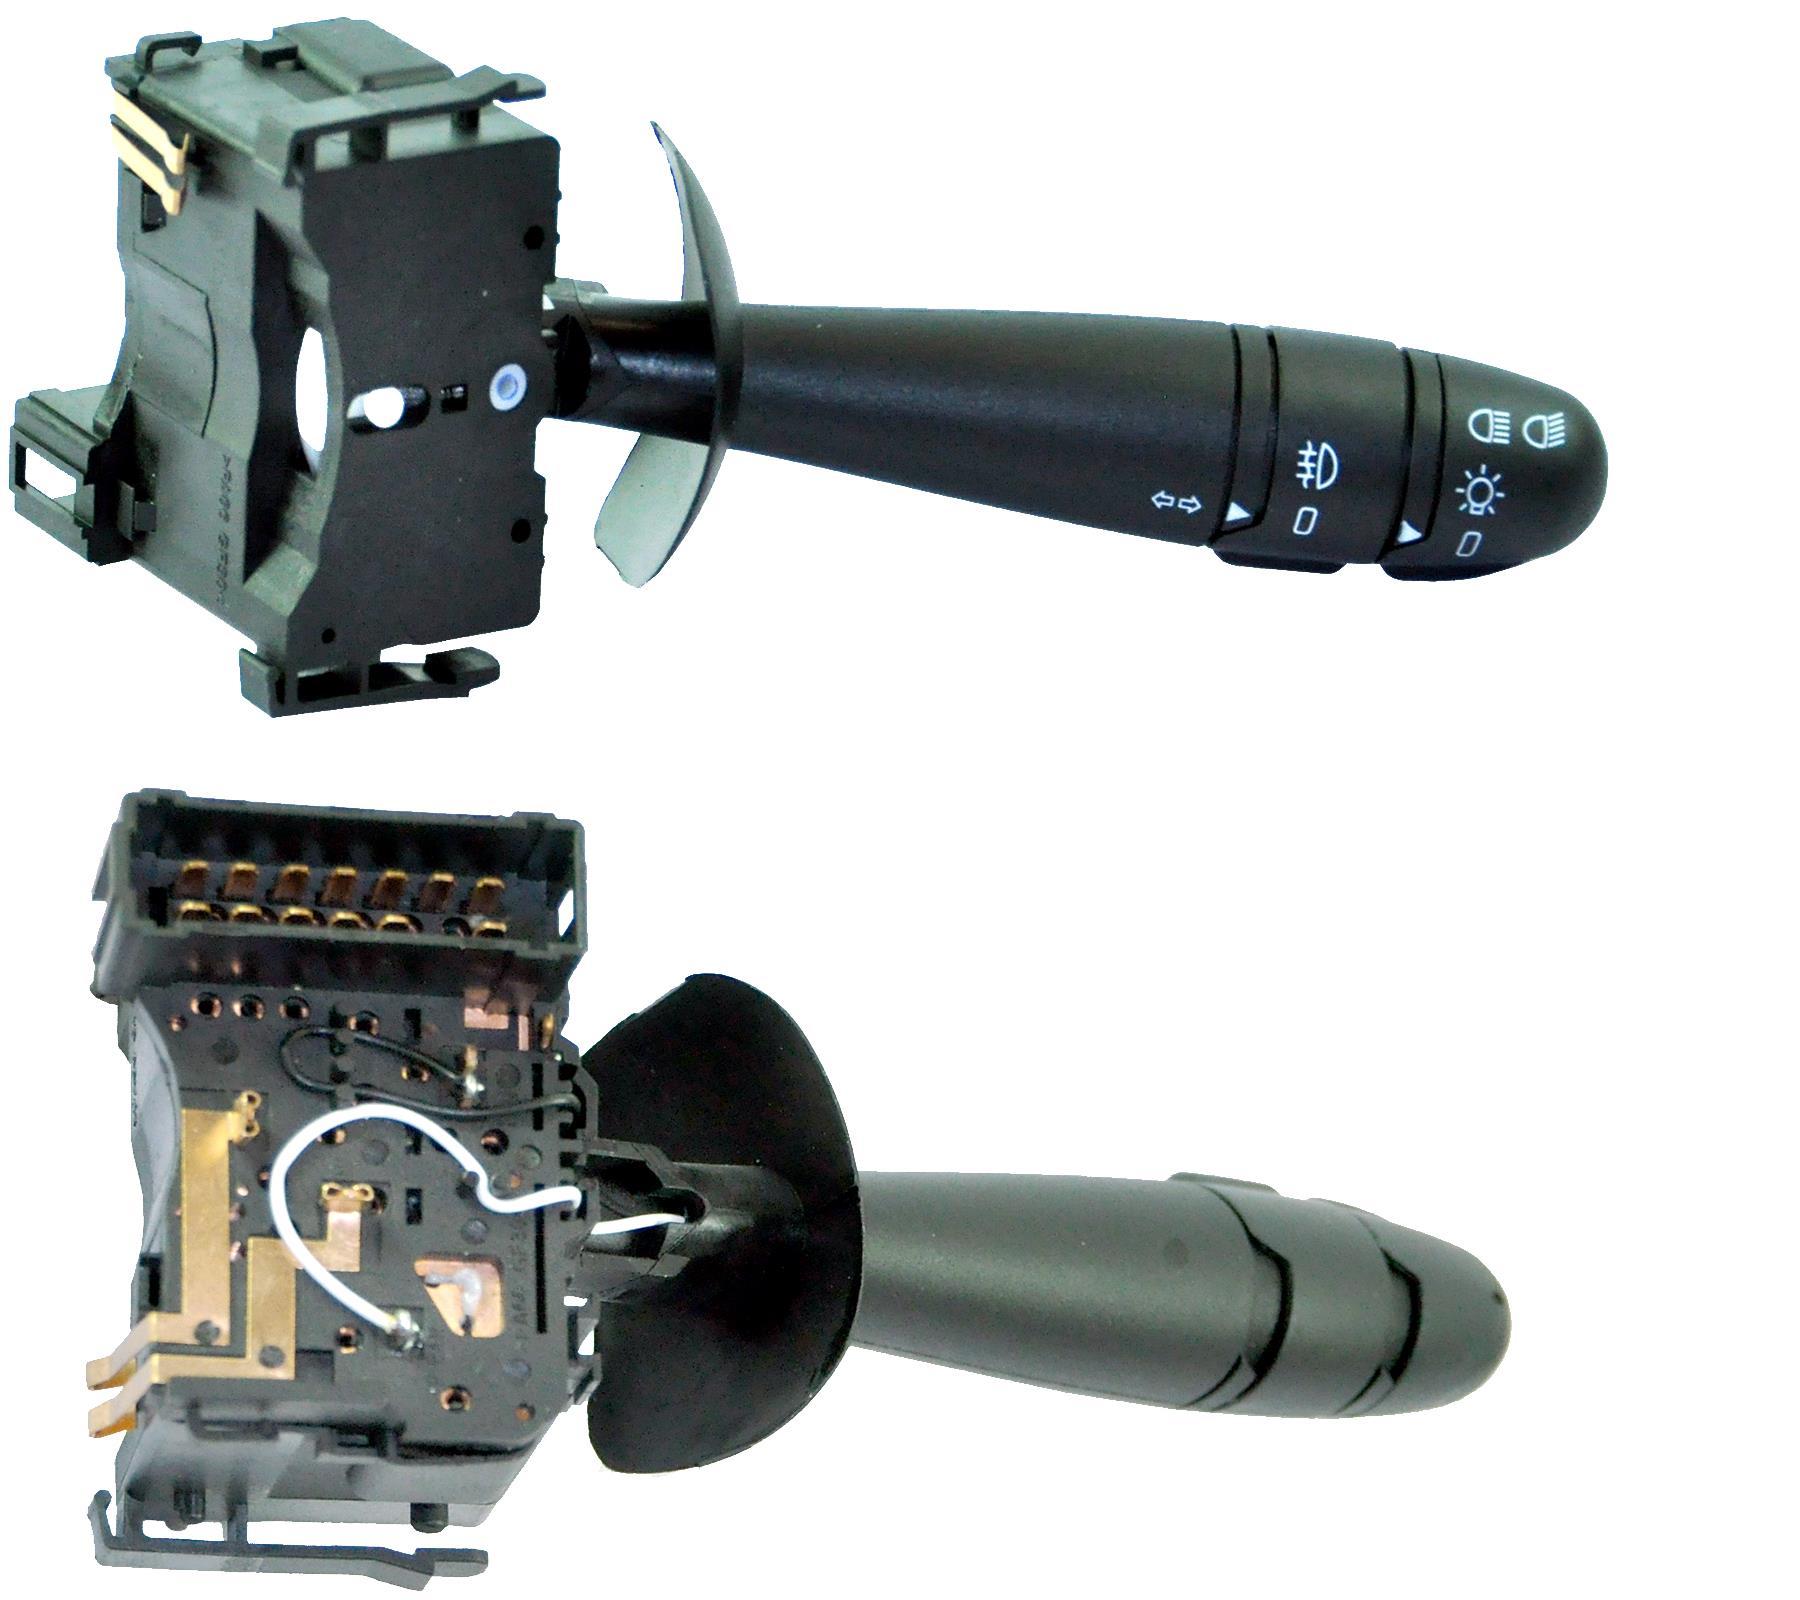 For Opel//Vauxhall Vivaro 4410524 Indicator Headlight Column Stalk Switch